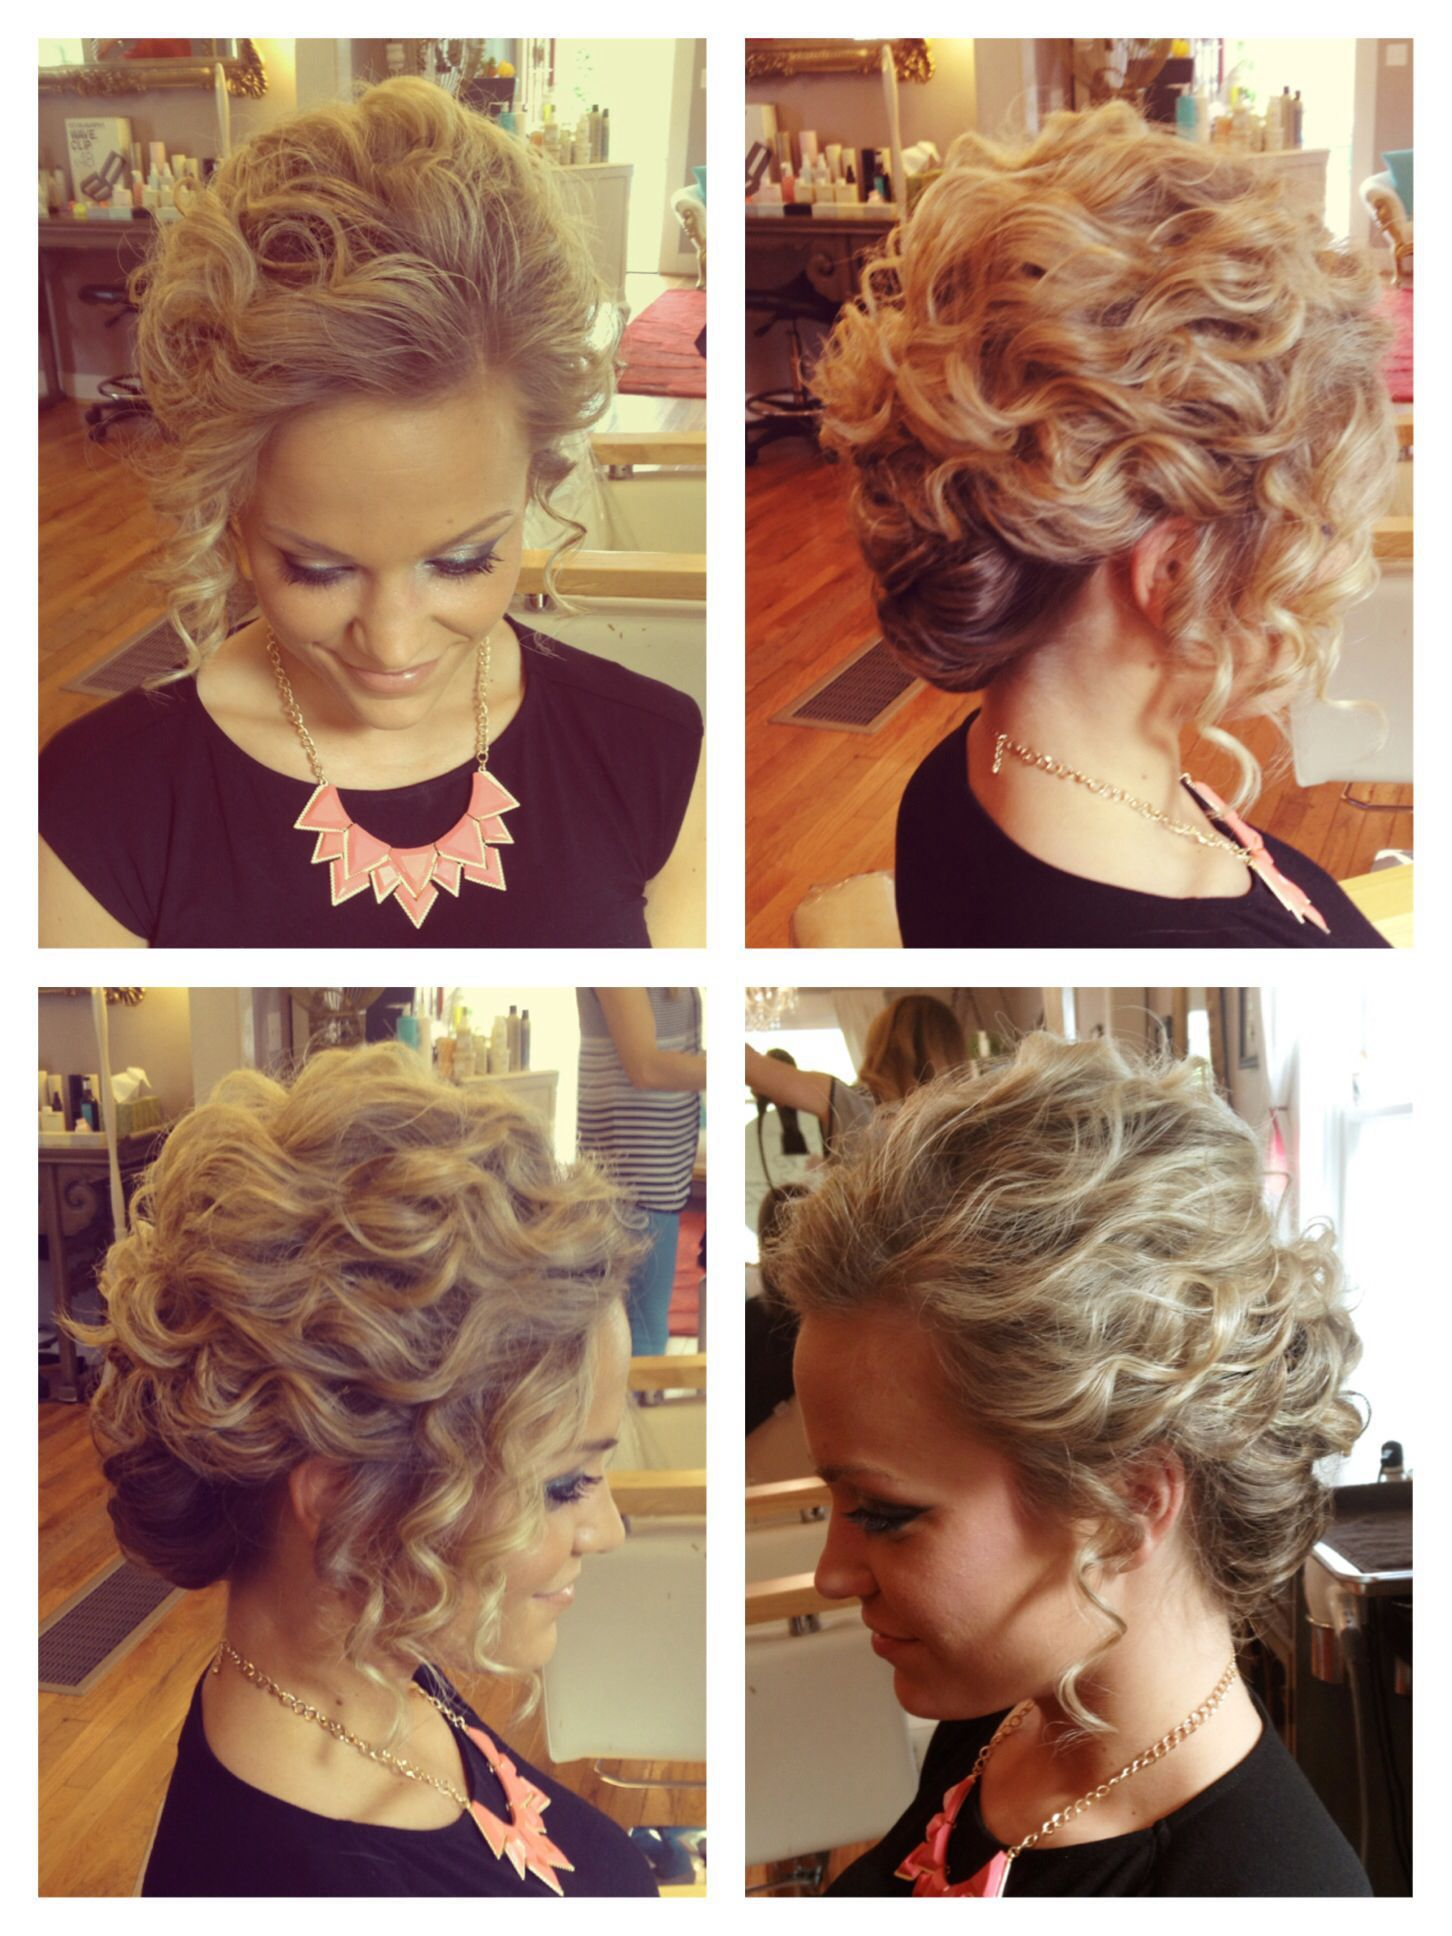 Kurzhaar Prom Frisuren für kurze lockige Haare #Prom #Frisuren